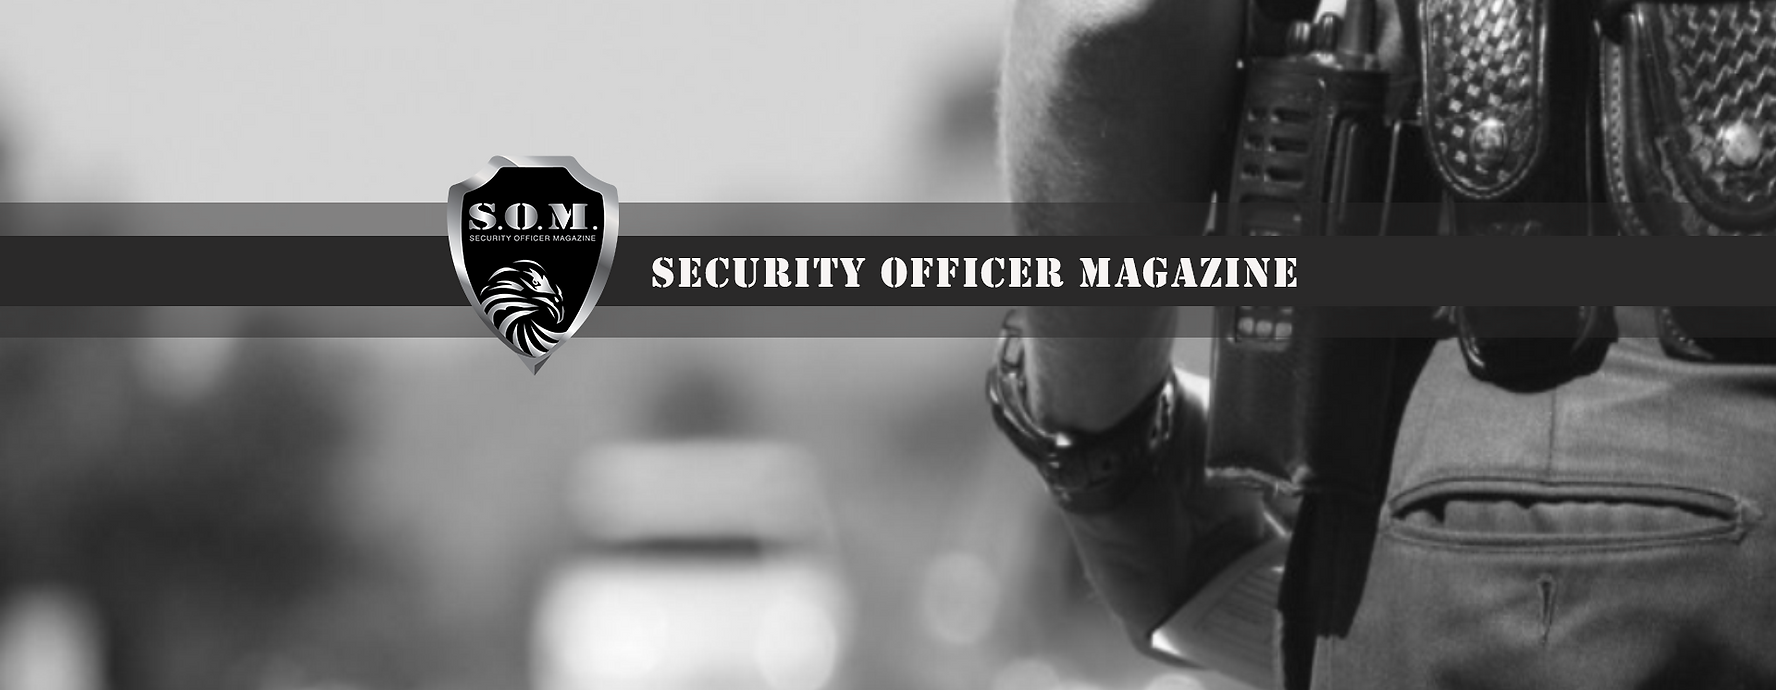 Security Officer Magazine header 3.png